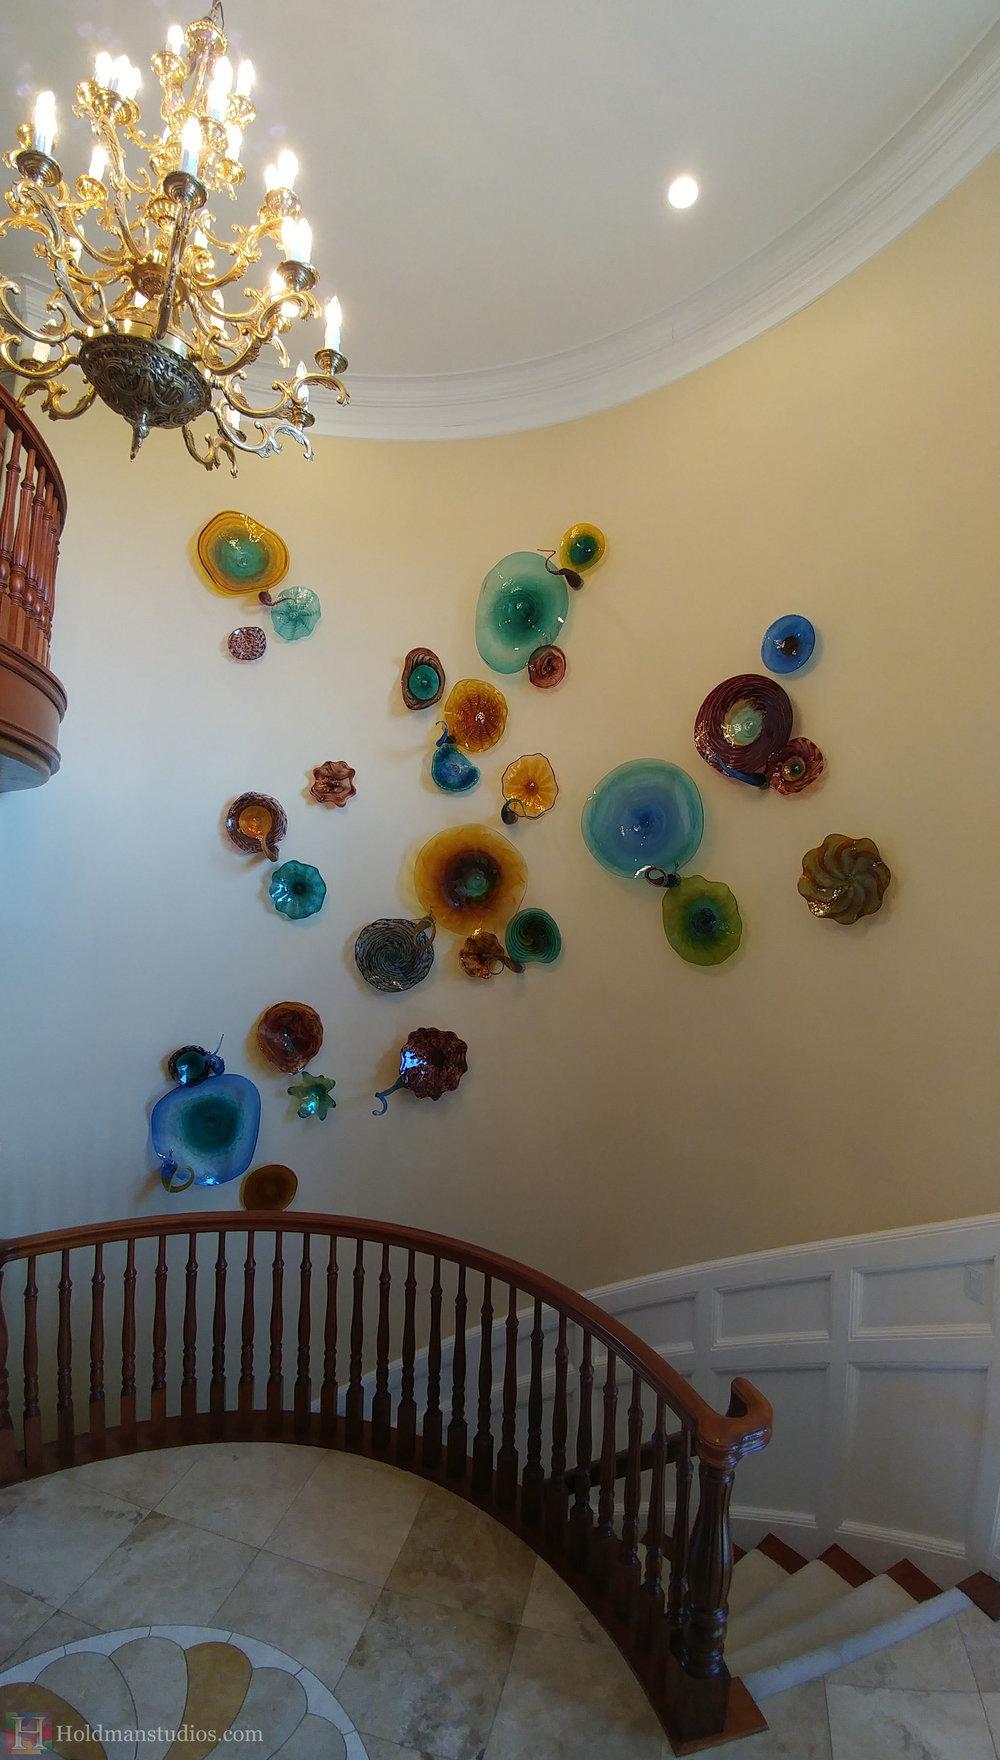 holdman-studios-hand-blown-glass-platters-bowls-tendrils-stair-wall-display-right-sideview.jpg